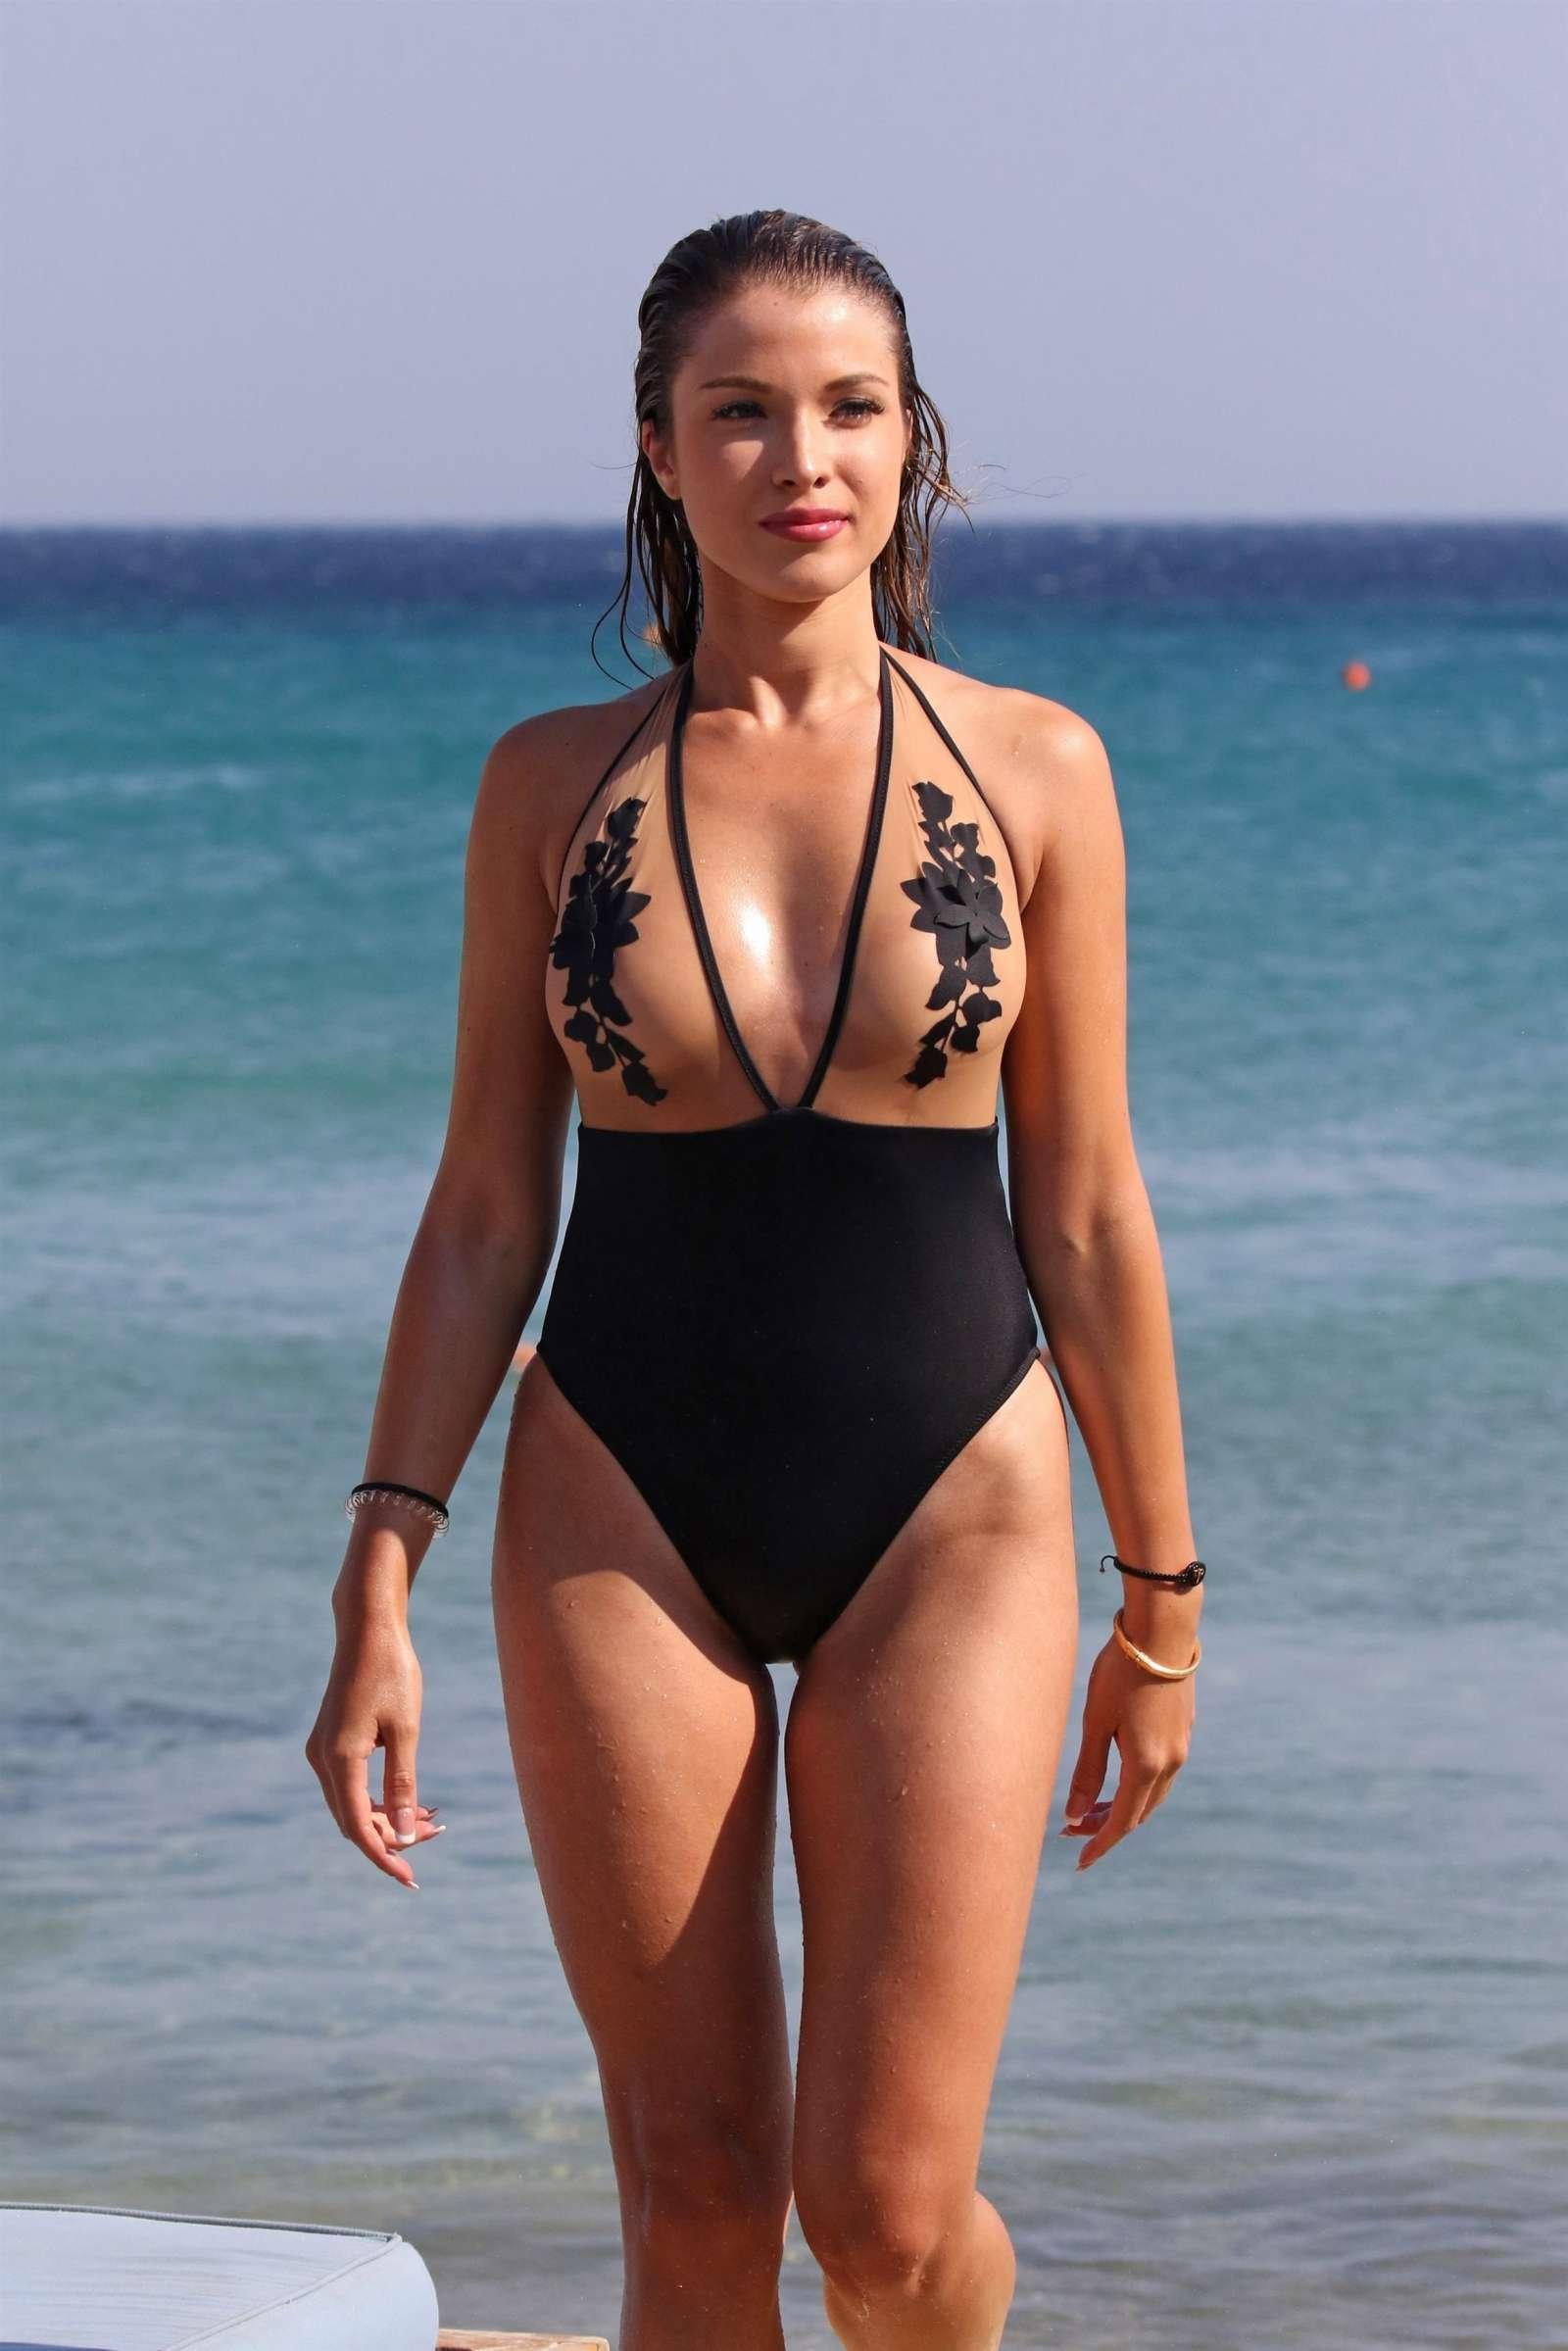 Catarina Sikiniotis in Swimsuit at the beach in Mykonos